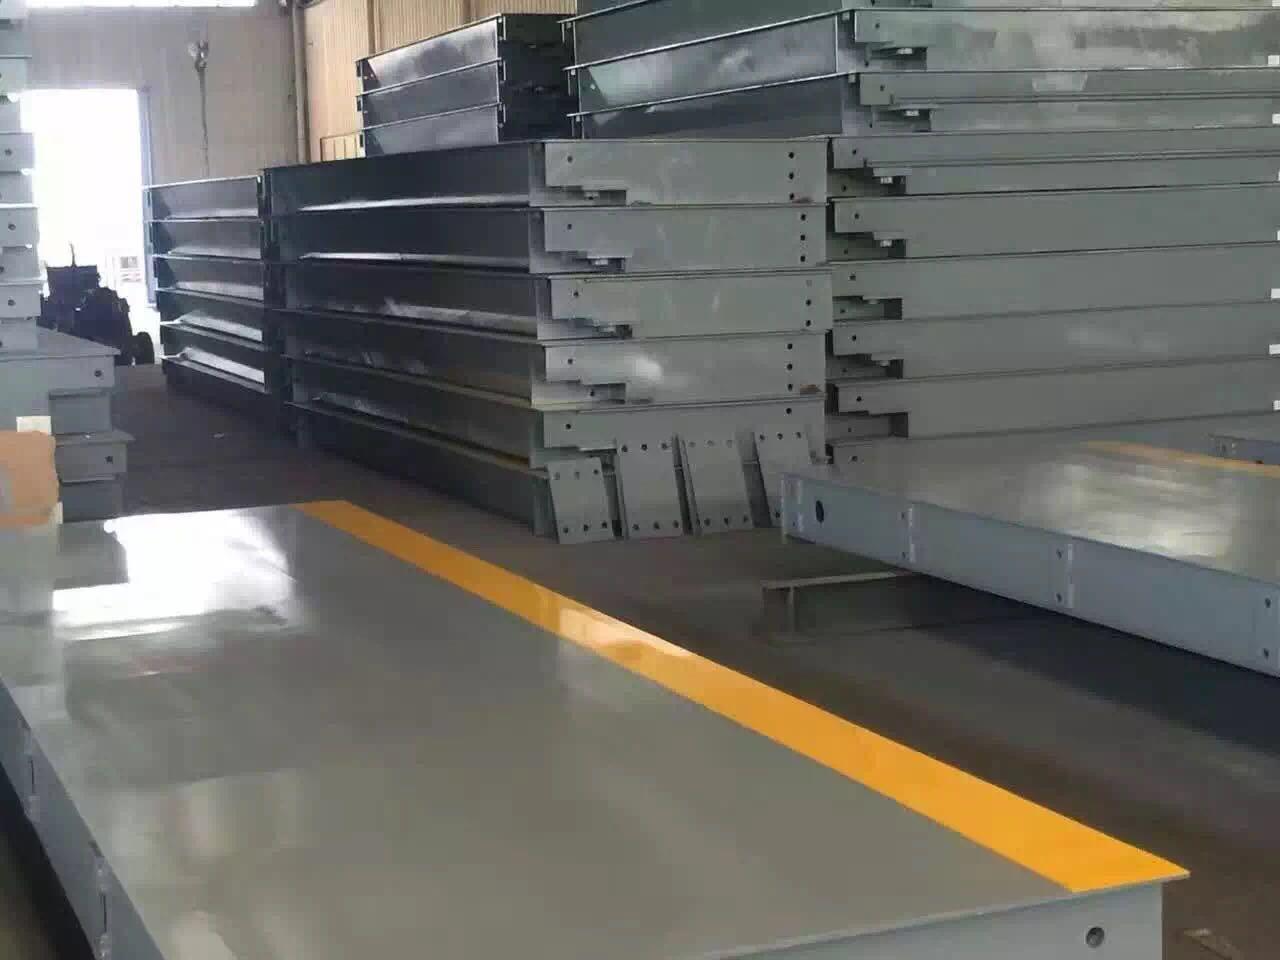 scs-铜梁县地磅厂家-数字地磅生产商